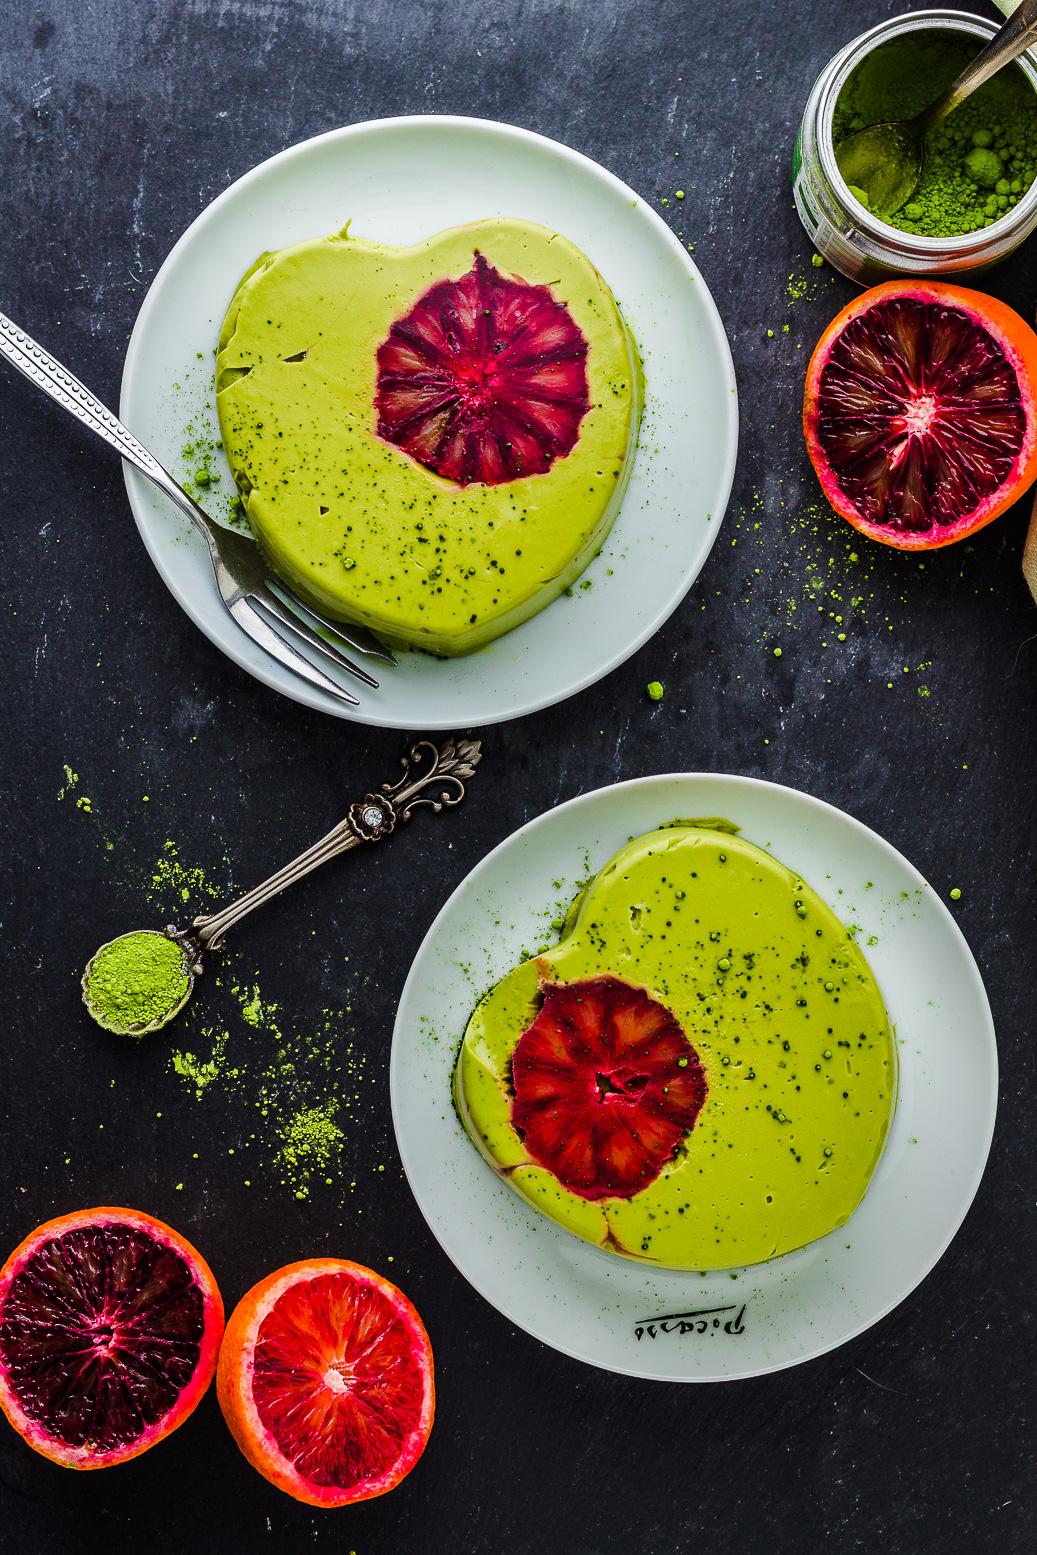 Avocadocreme Dessert mit Matcha #vegan #avocado #dessert